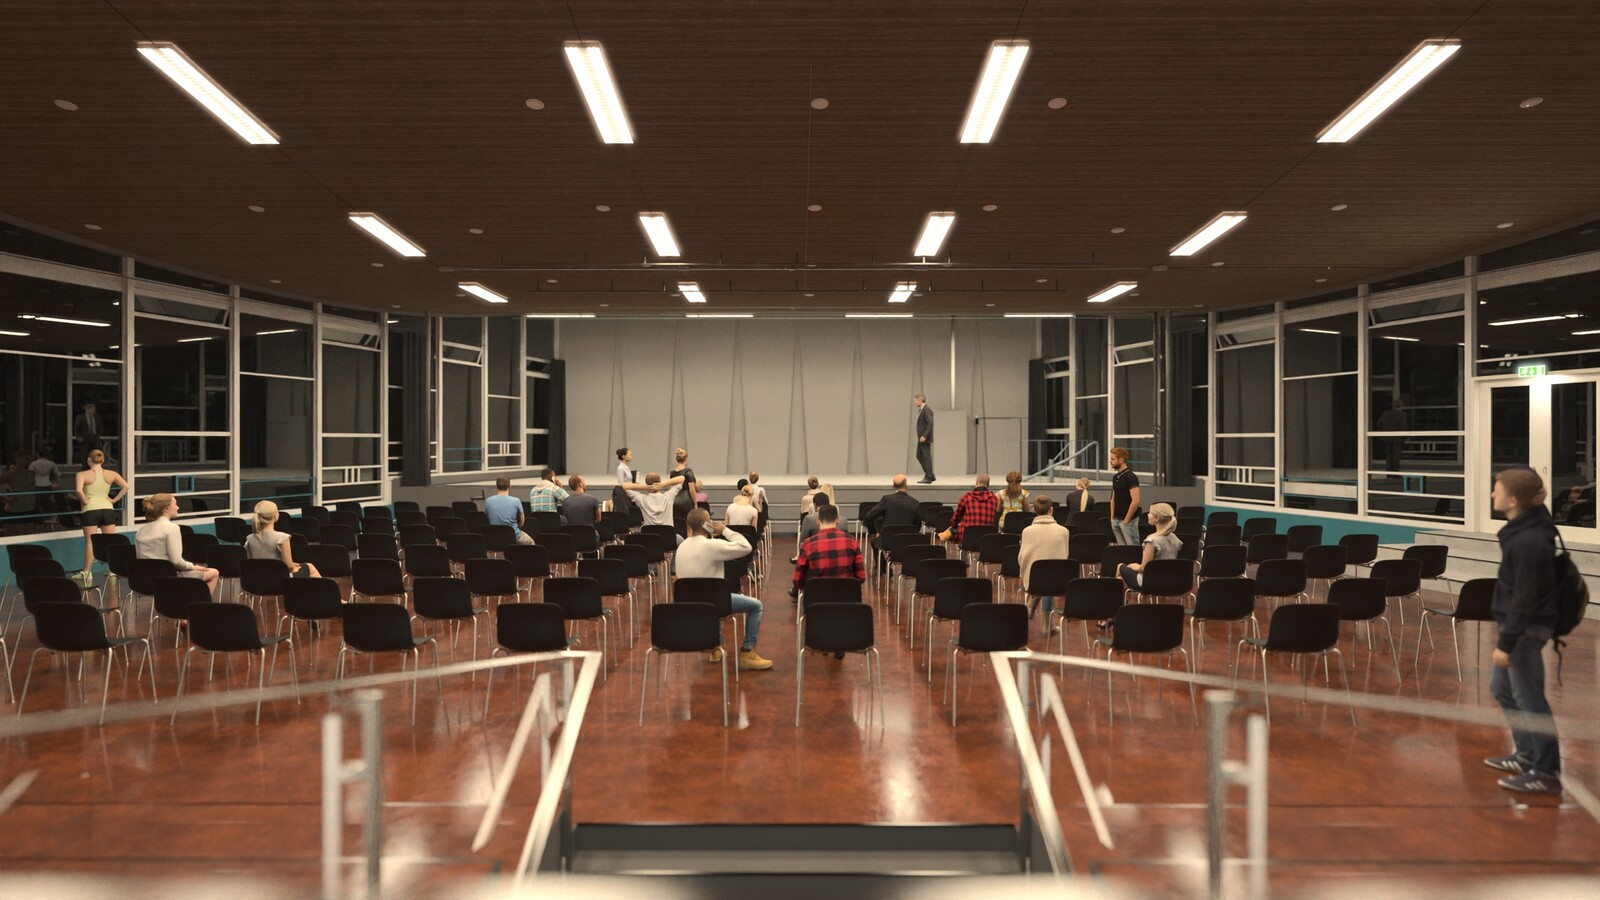 SketchUp 2021 + Thea Render V3 Broedplaats LELY (The Lely Incubator) Auditorium Amsterdam Showroom-Scene 1B 25m31s HD1080 1024sp